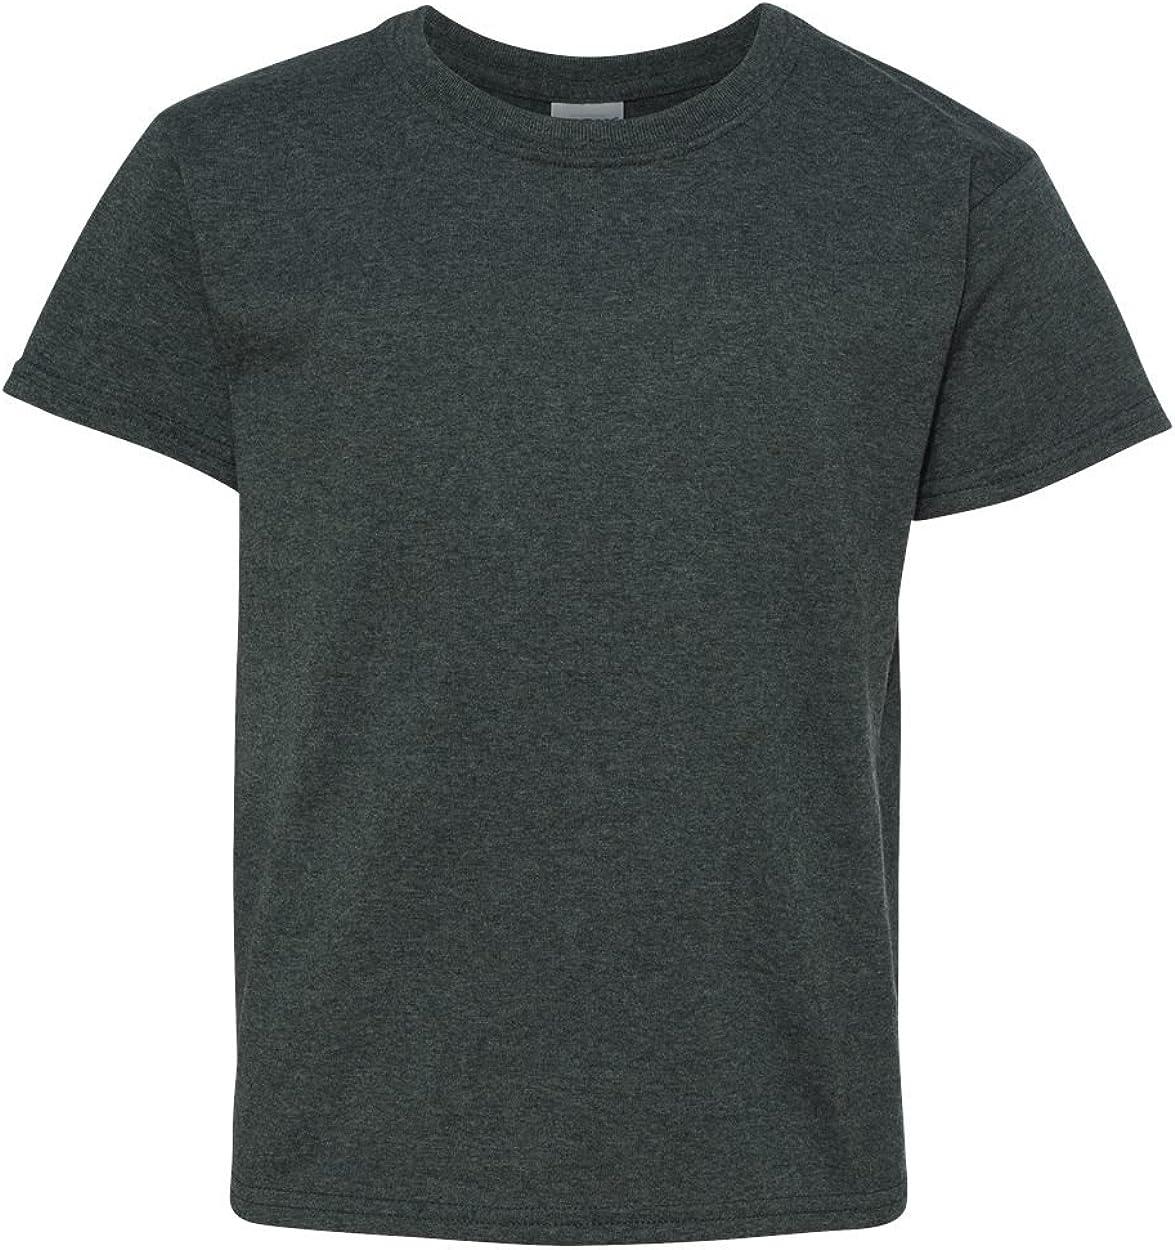 Heavy Cotton T-Shirt (G500B) Dark Heather, M (Pack of 12)